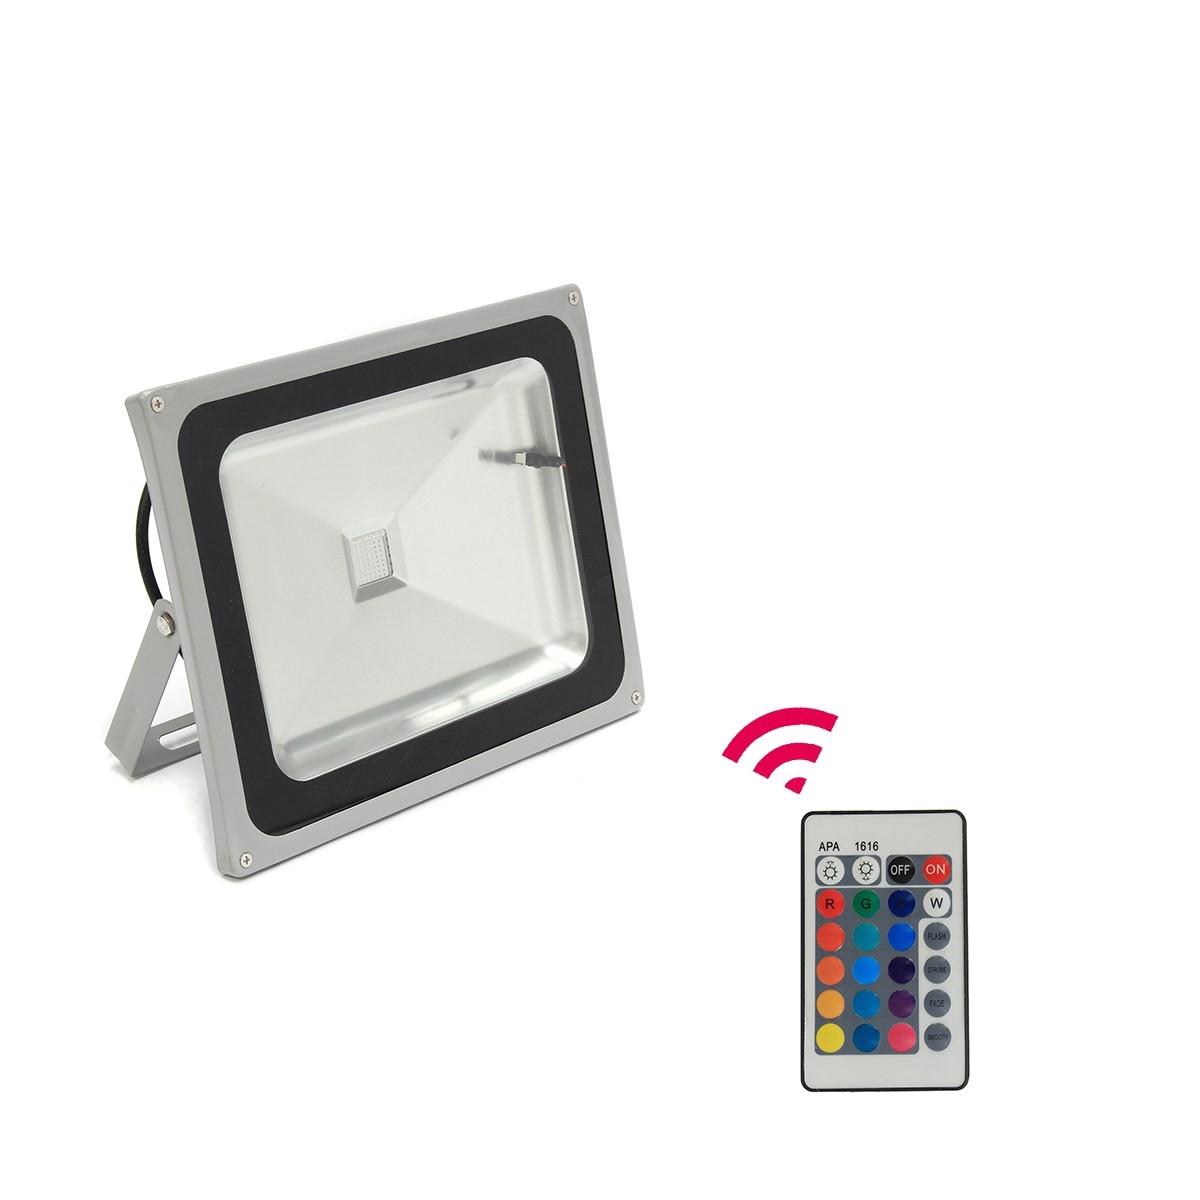 Safurance 50W PIR LED RBG Focos Reflectores Colores 16 Colorful Spotlights Floodlights Building Automation<br>